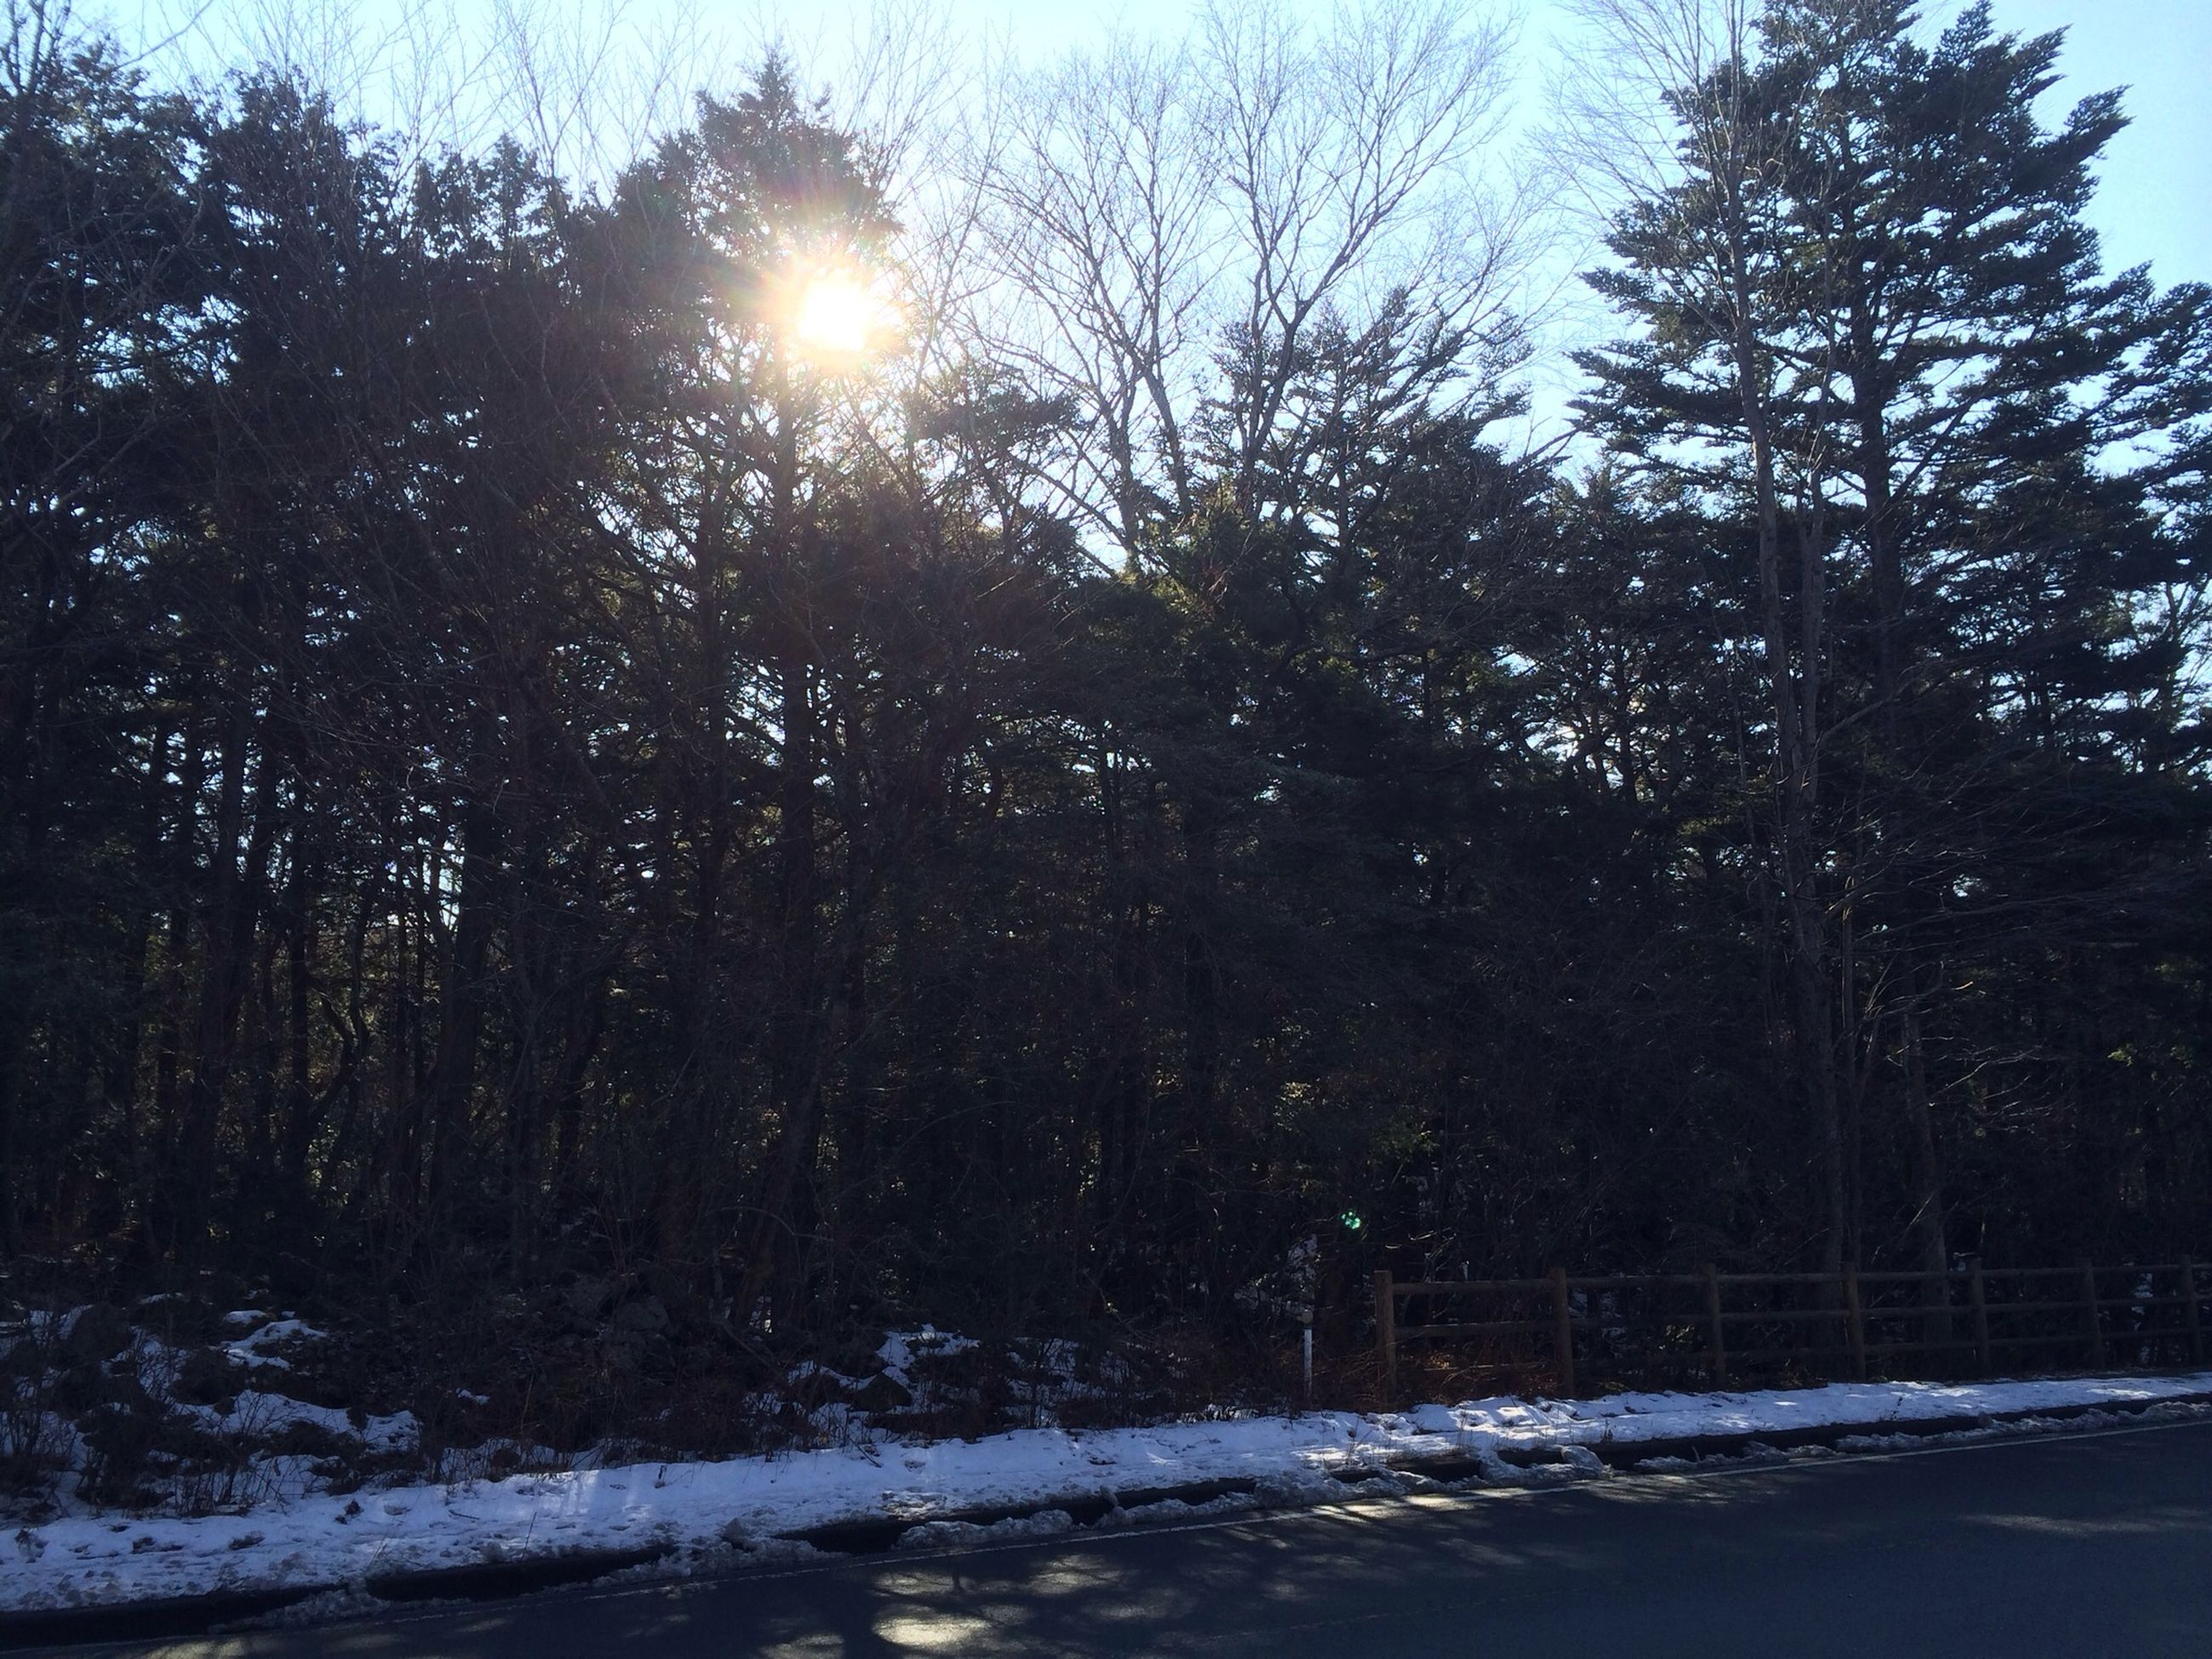 snow, winter, cold temperature, season, tree, weather, frozen, tranquility, covering, nature, bare tree, tranquil scene, beauty in nature, scenics, cold, forest, covered, landscape, non-urban scene, white color